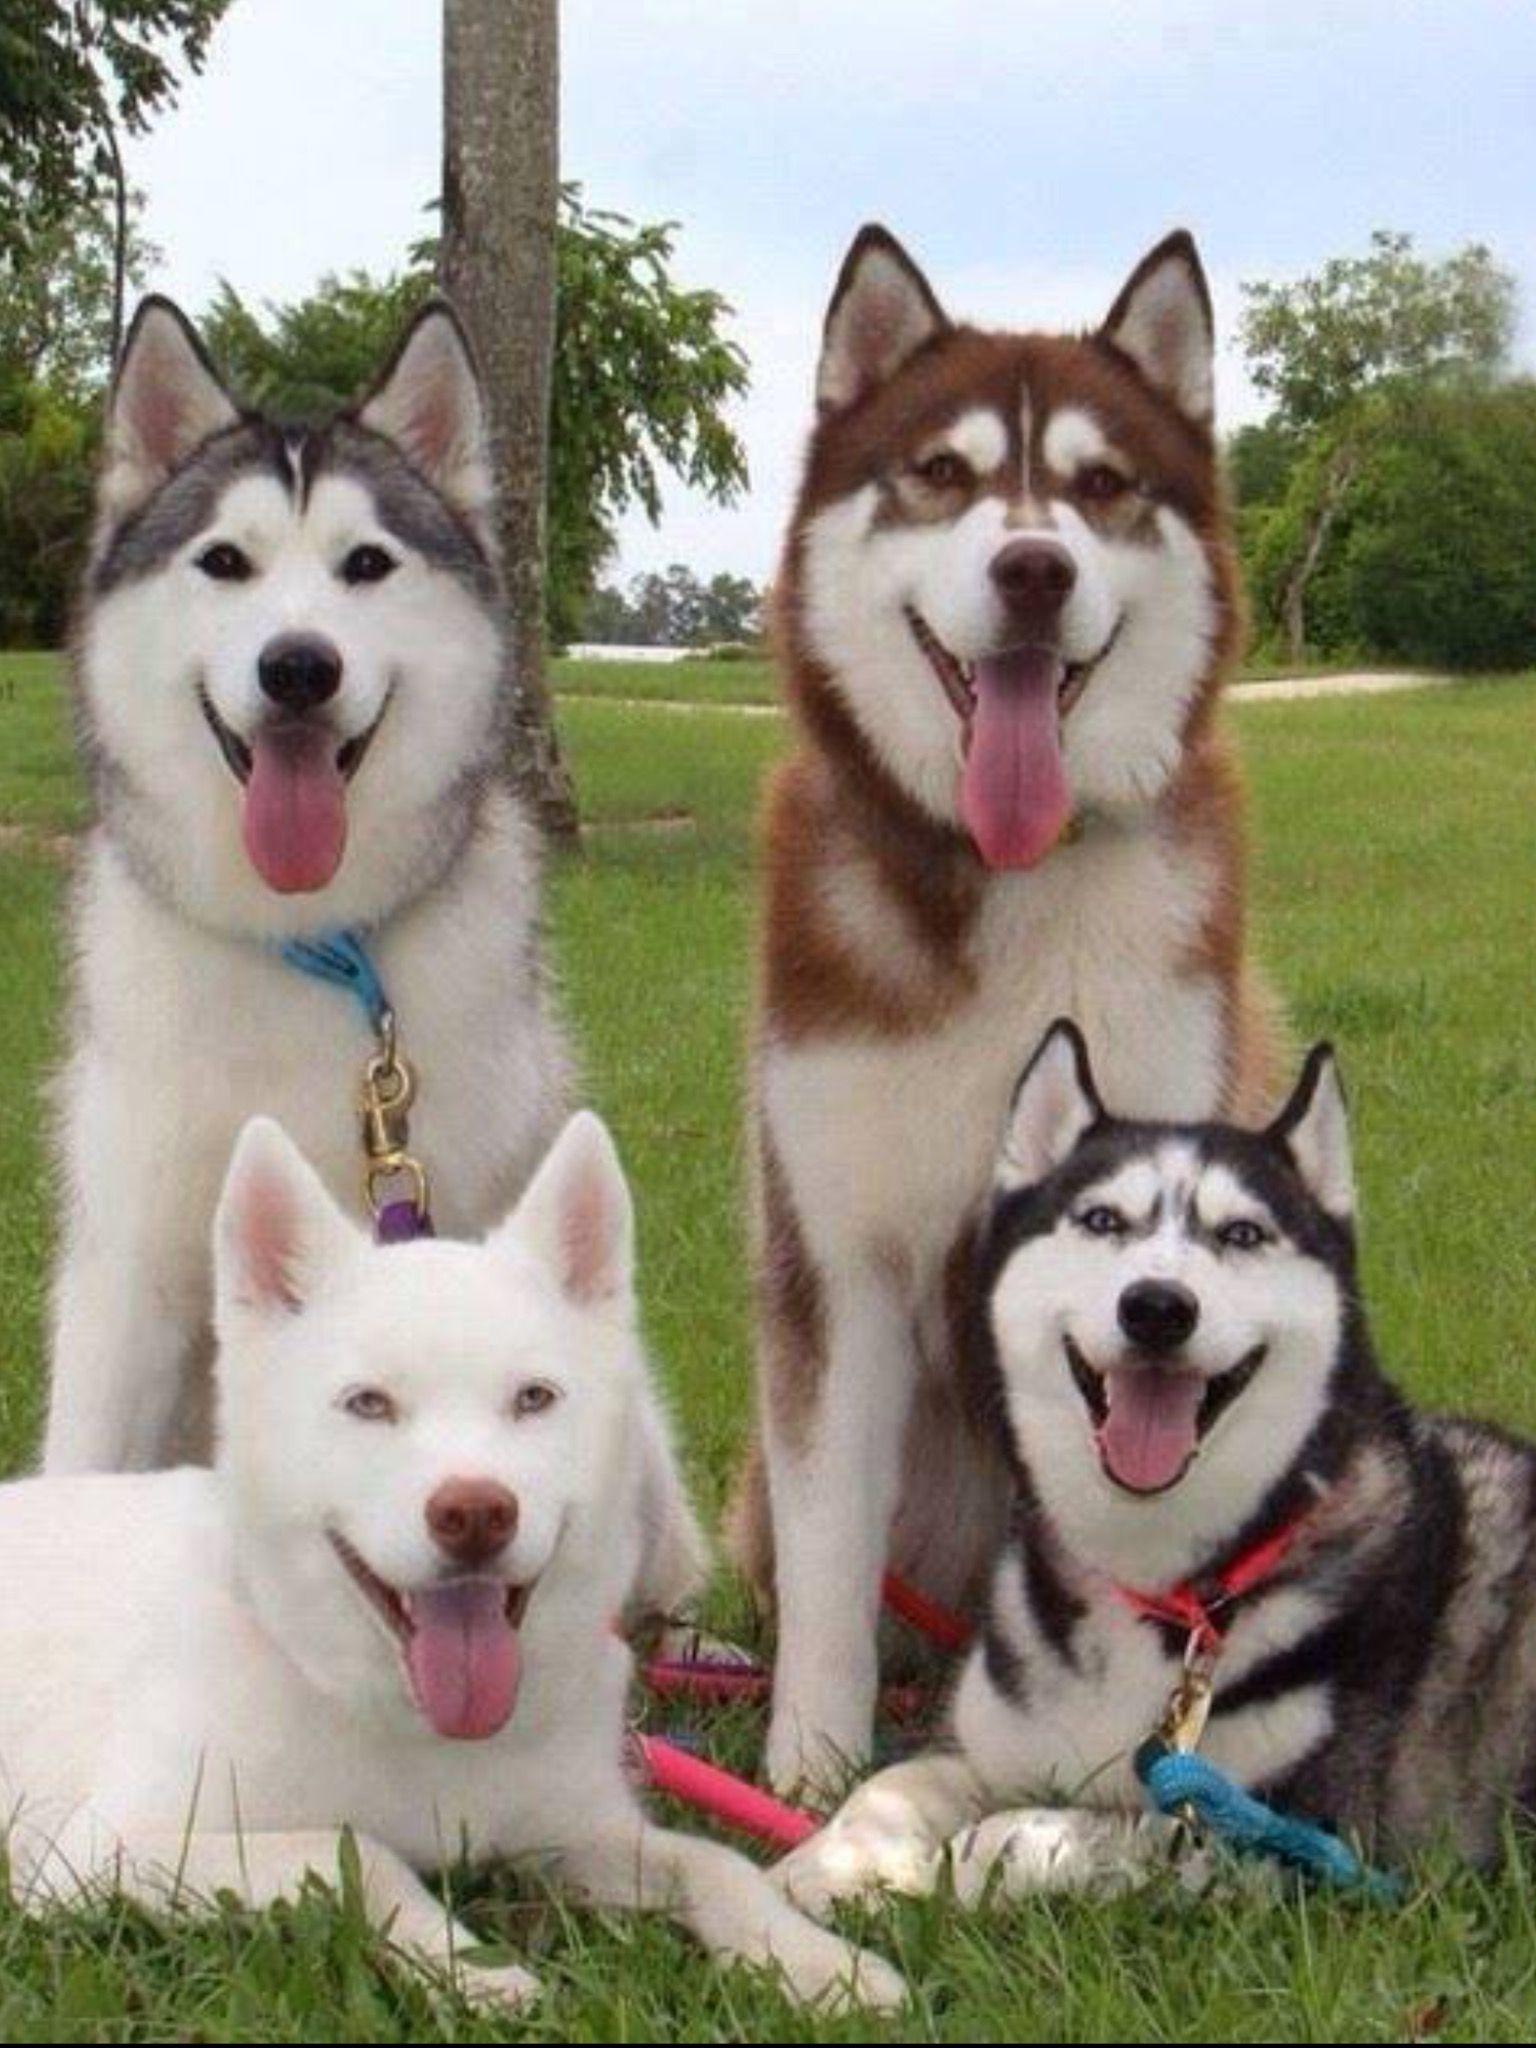 Gray husky, Red husky, white husky, black husky. Huskies, they are gorgeous!